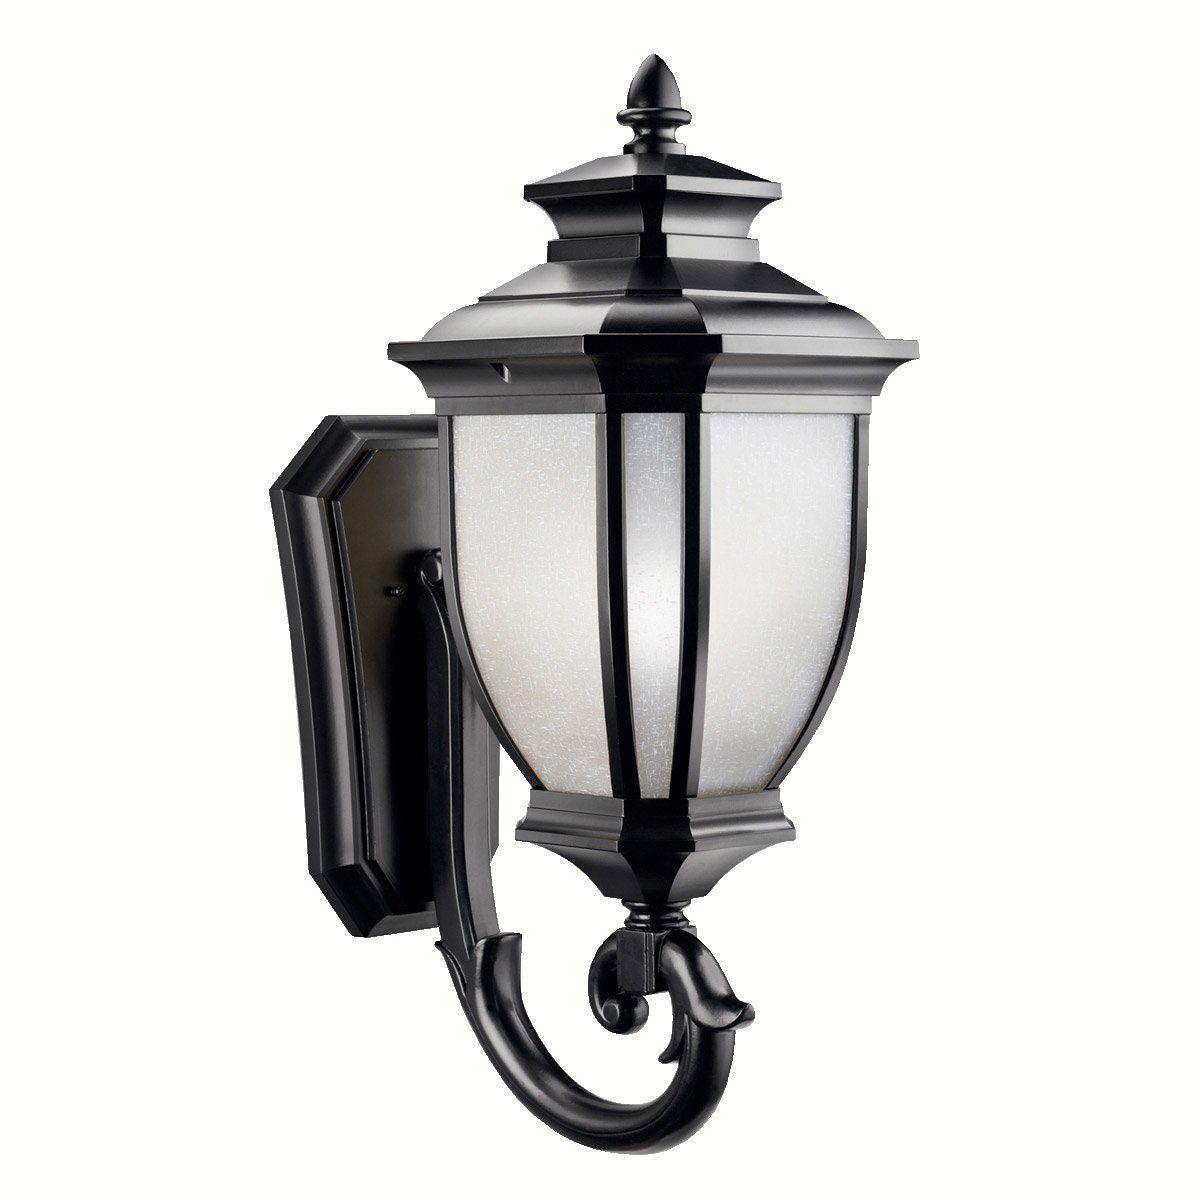 Kichler lighting bk salisbury light inch black outdoor wall